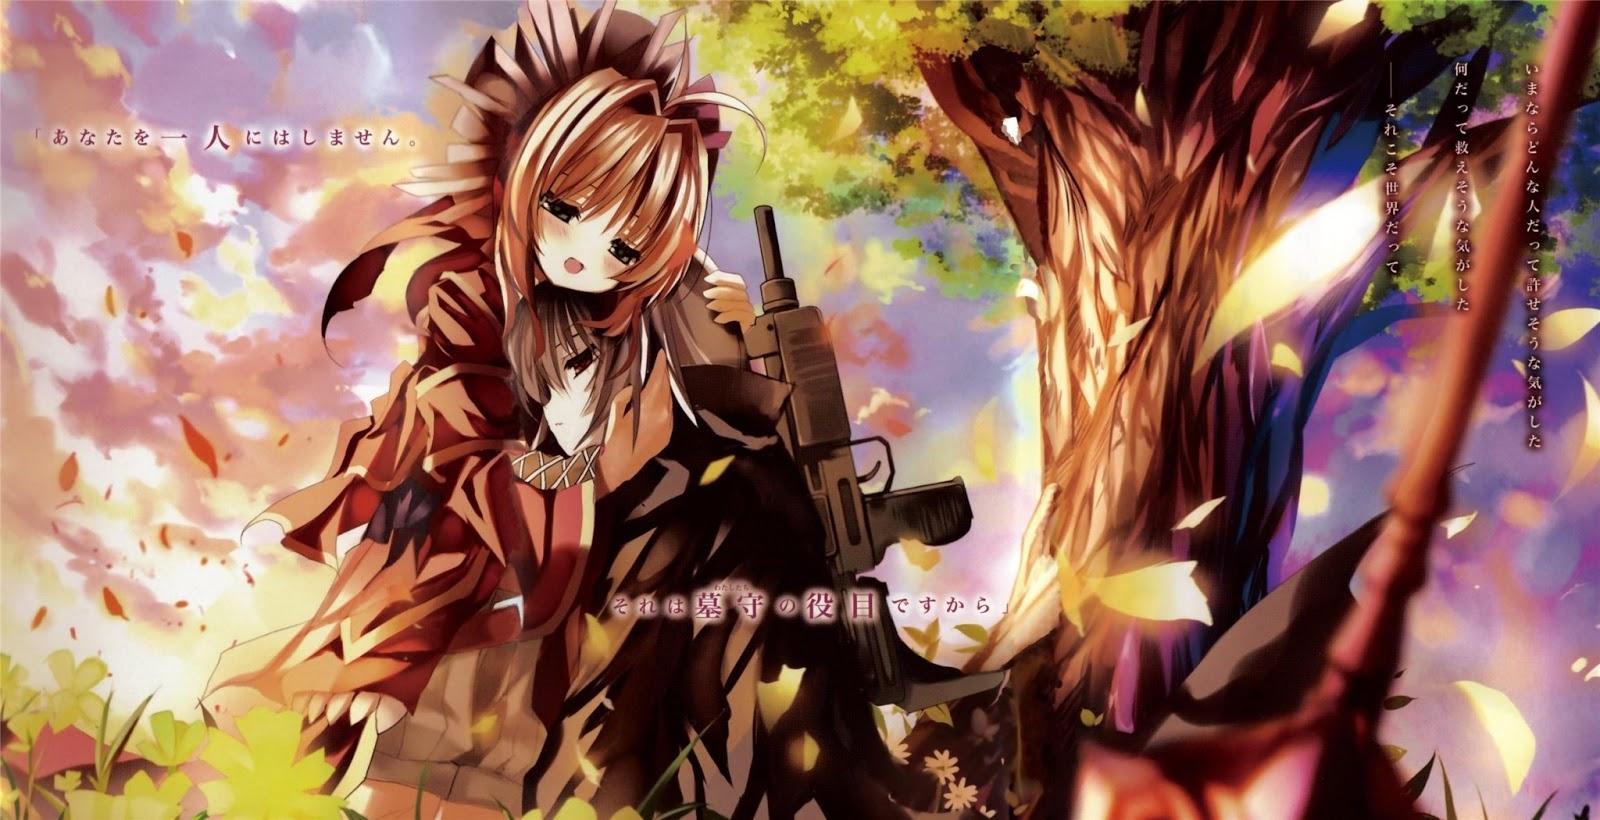 Kamisama No Inai Nichiyoubi 12 12 Ova MF Casper Anime